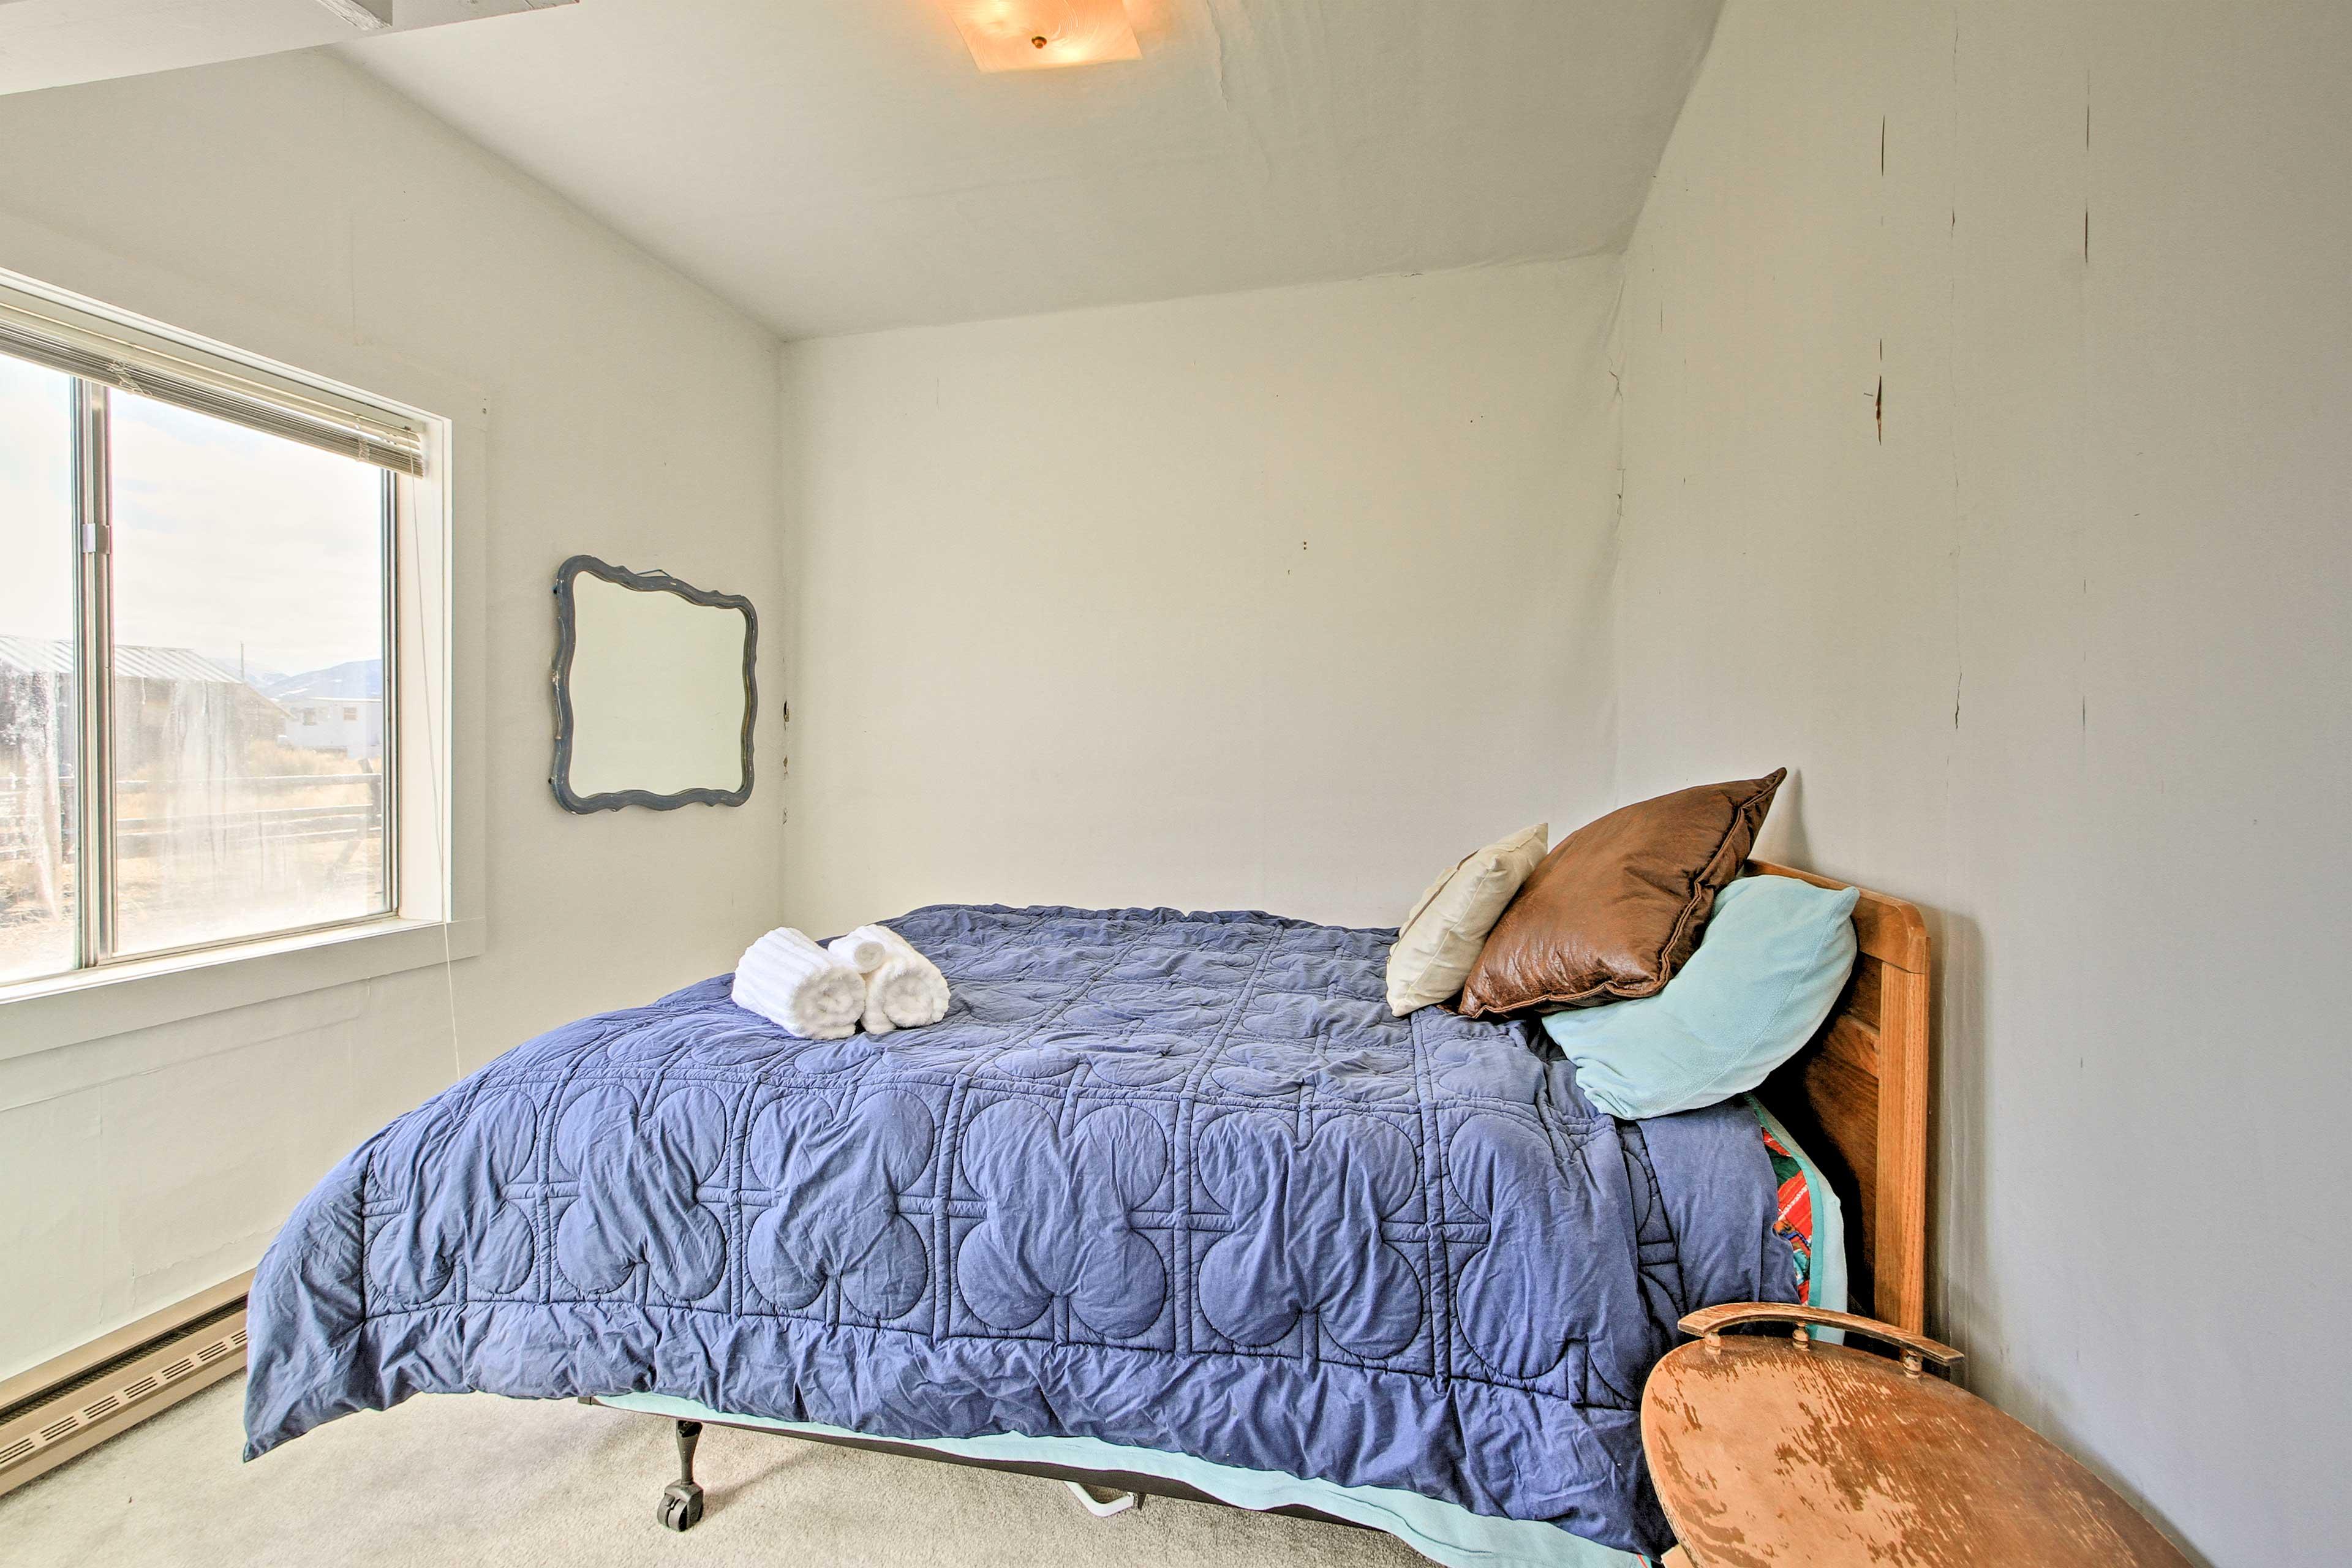 Peaceful slumbers await in the master bedroom.